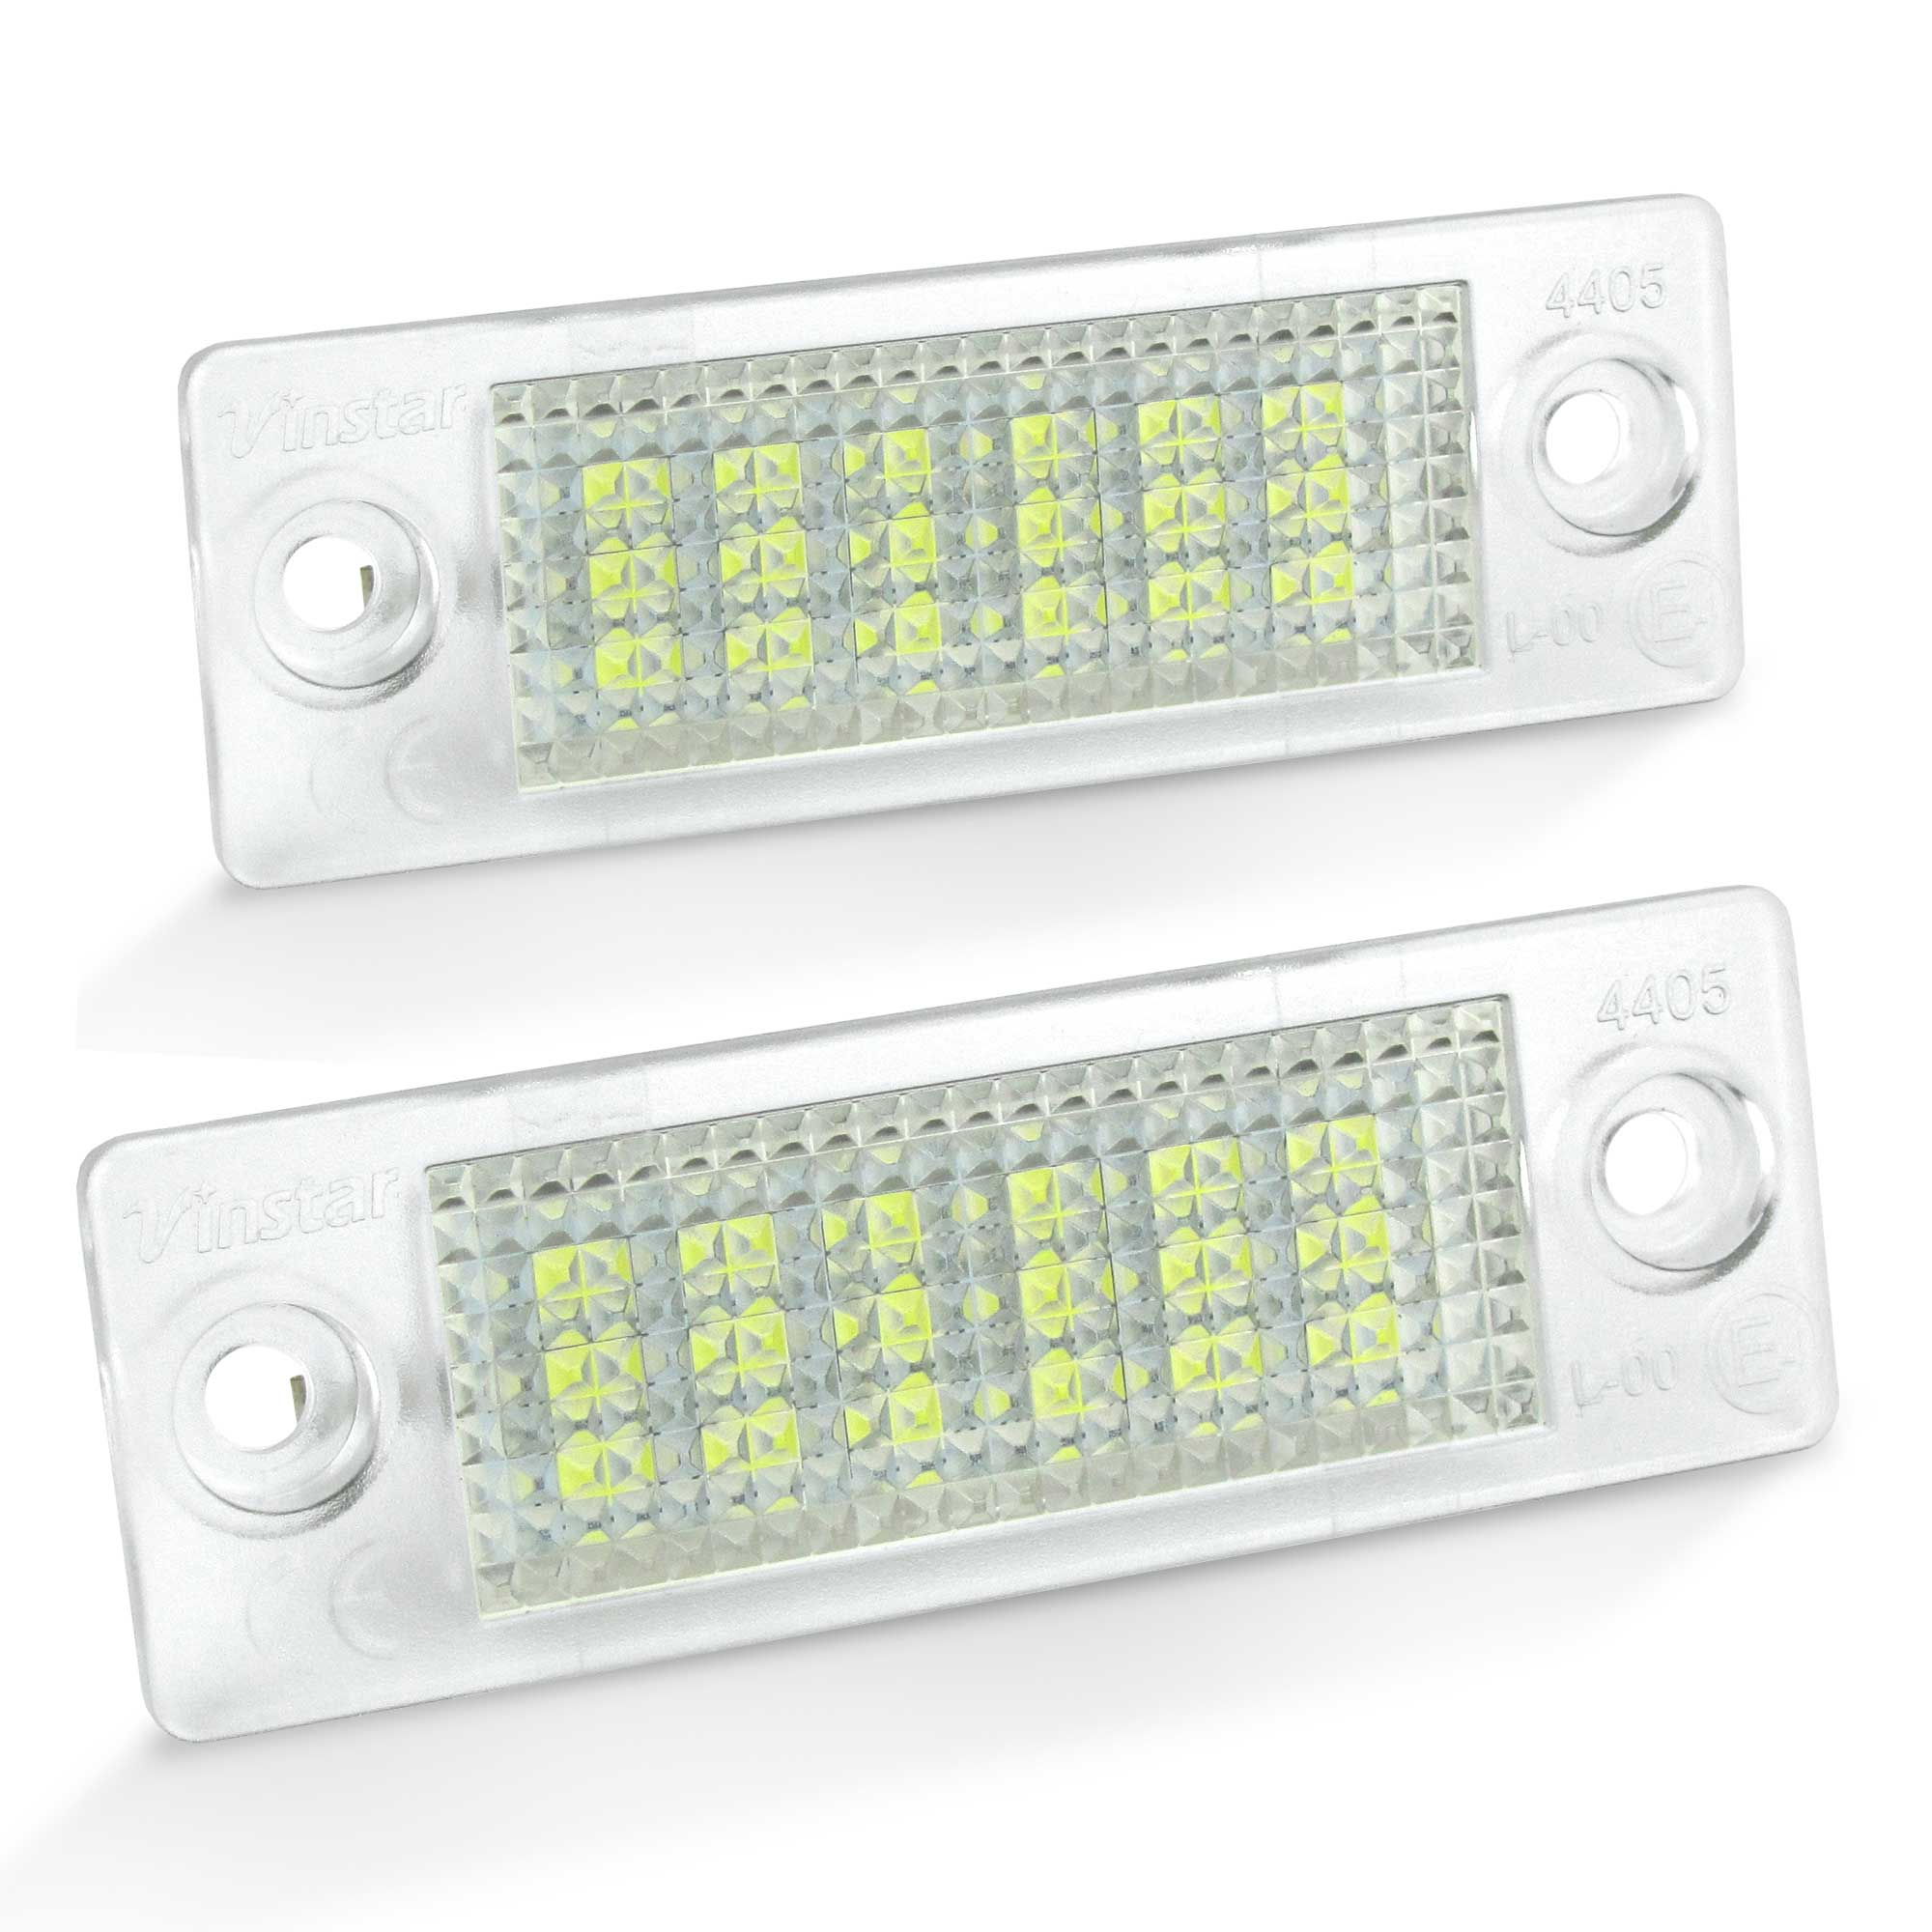 premium led smd kennzeichenbeleuchtung birne xenon f r vw. Black Bedroom Furniture Sets. Home Design Ideas